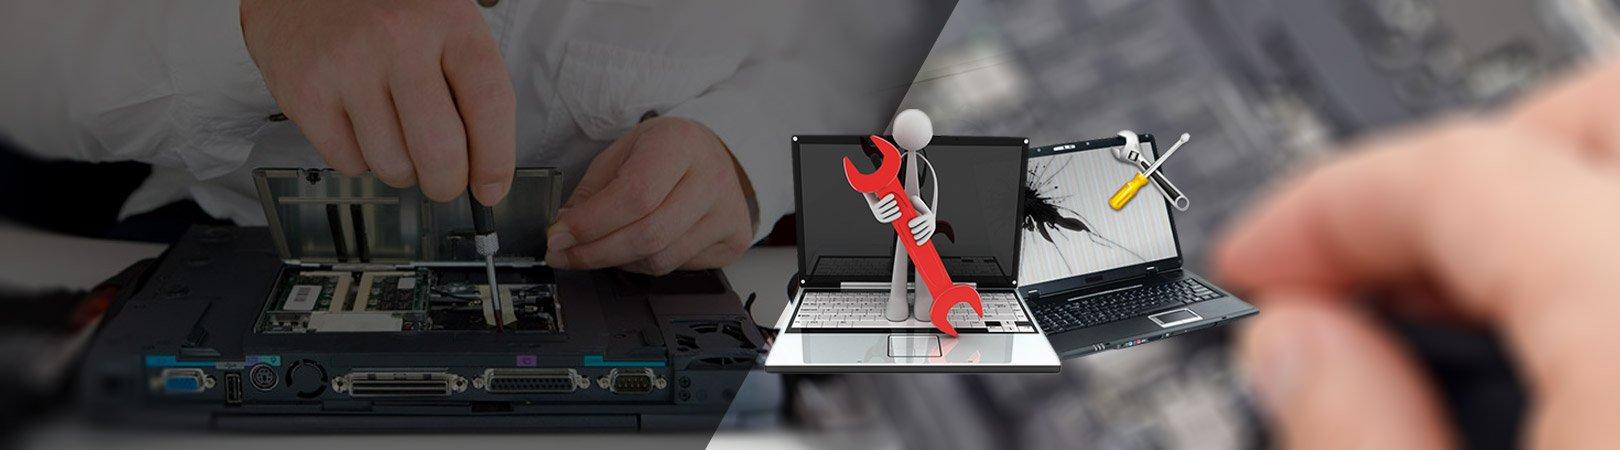 banner image - Acer Laptop Heating Repair